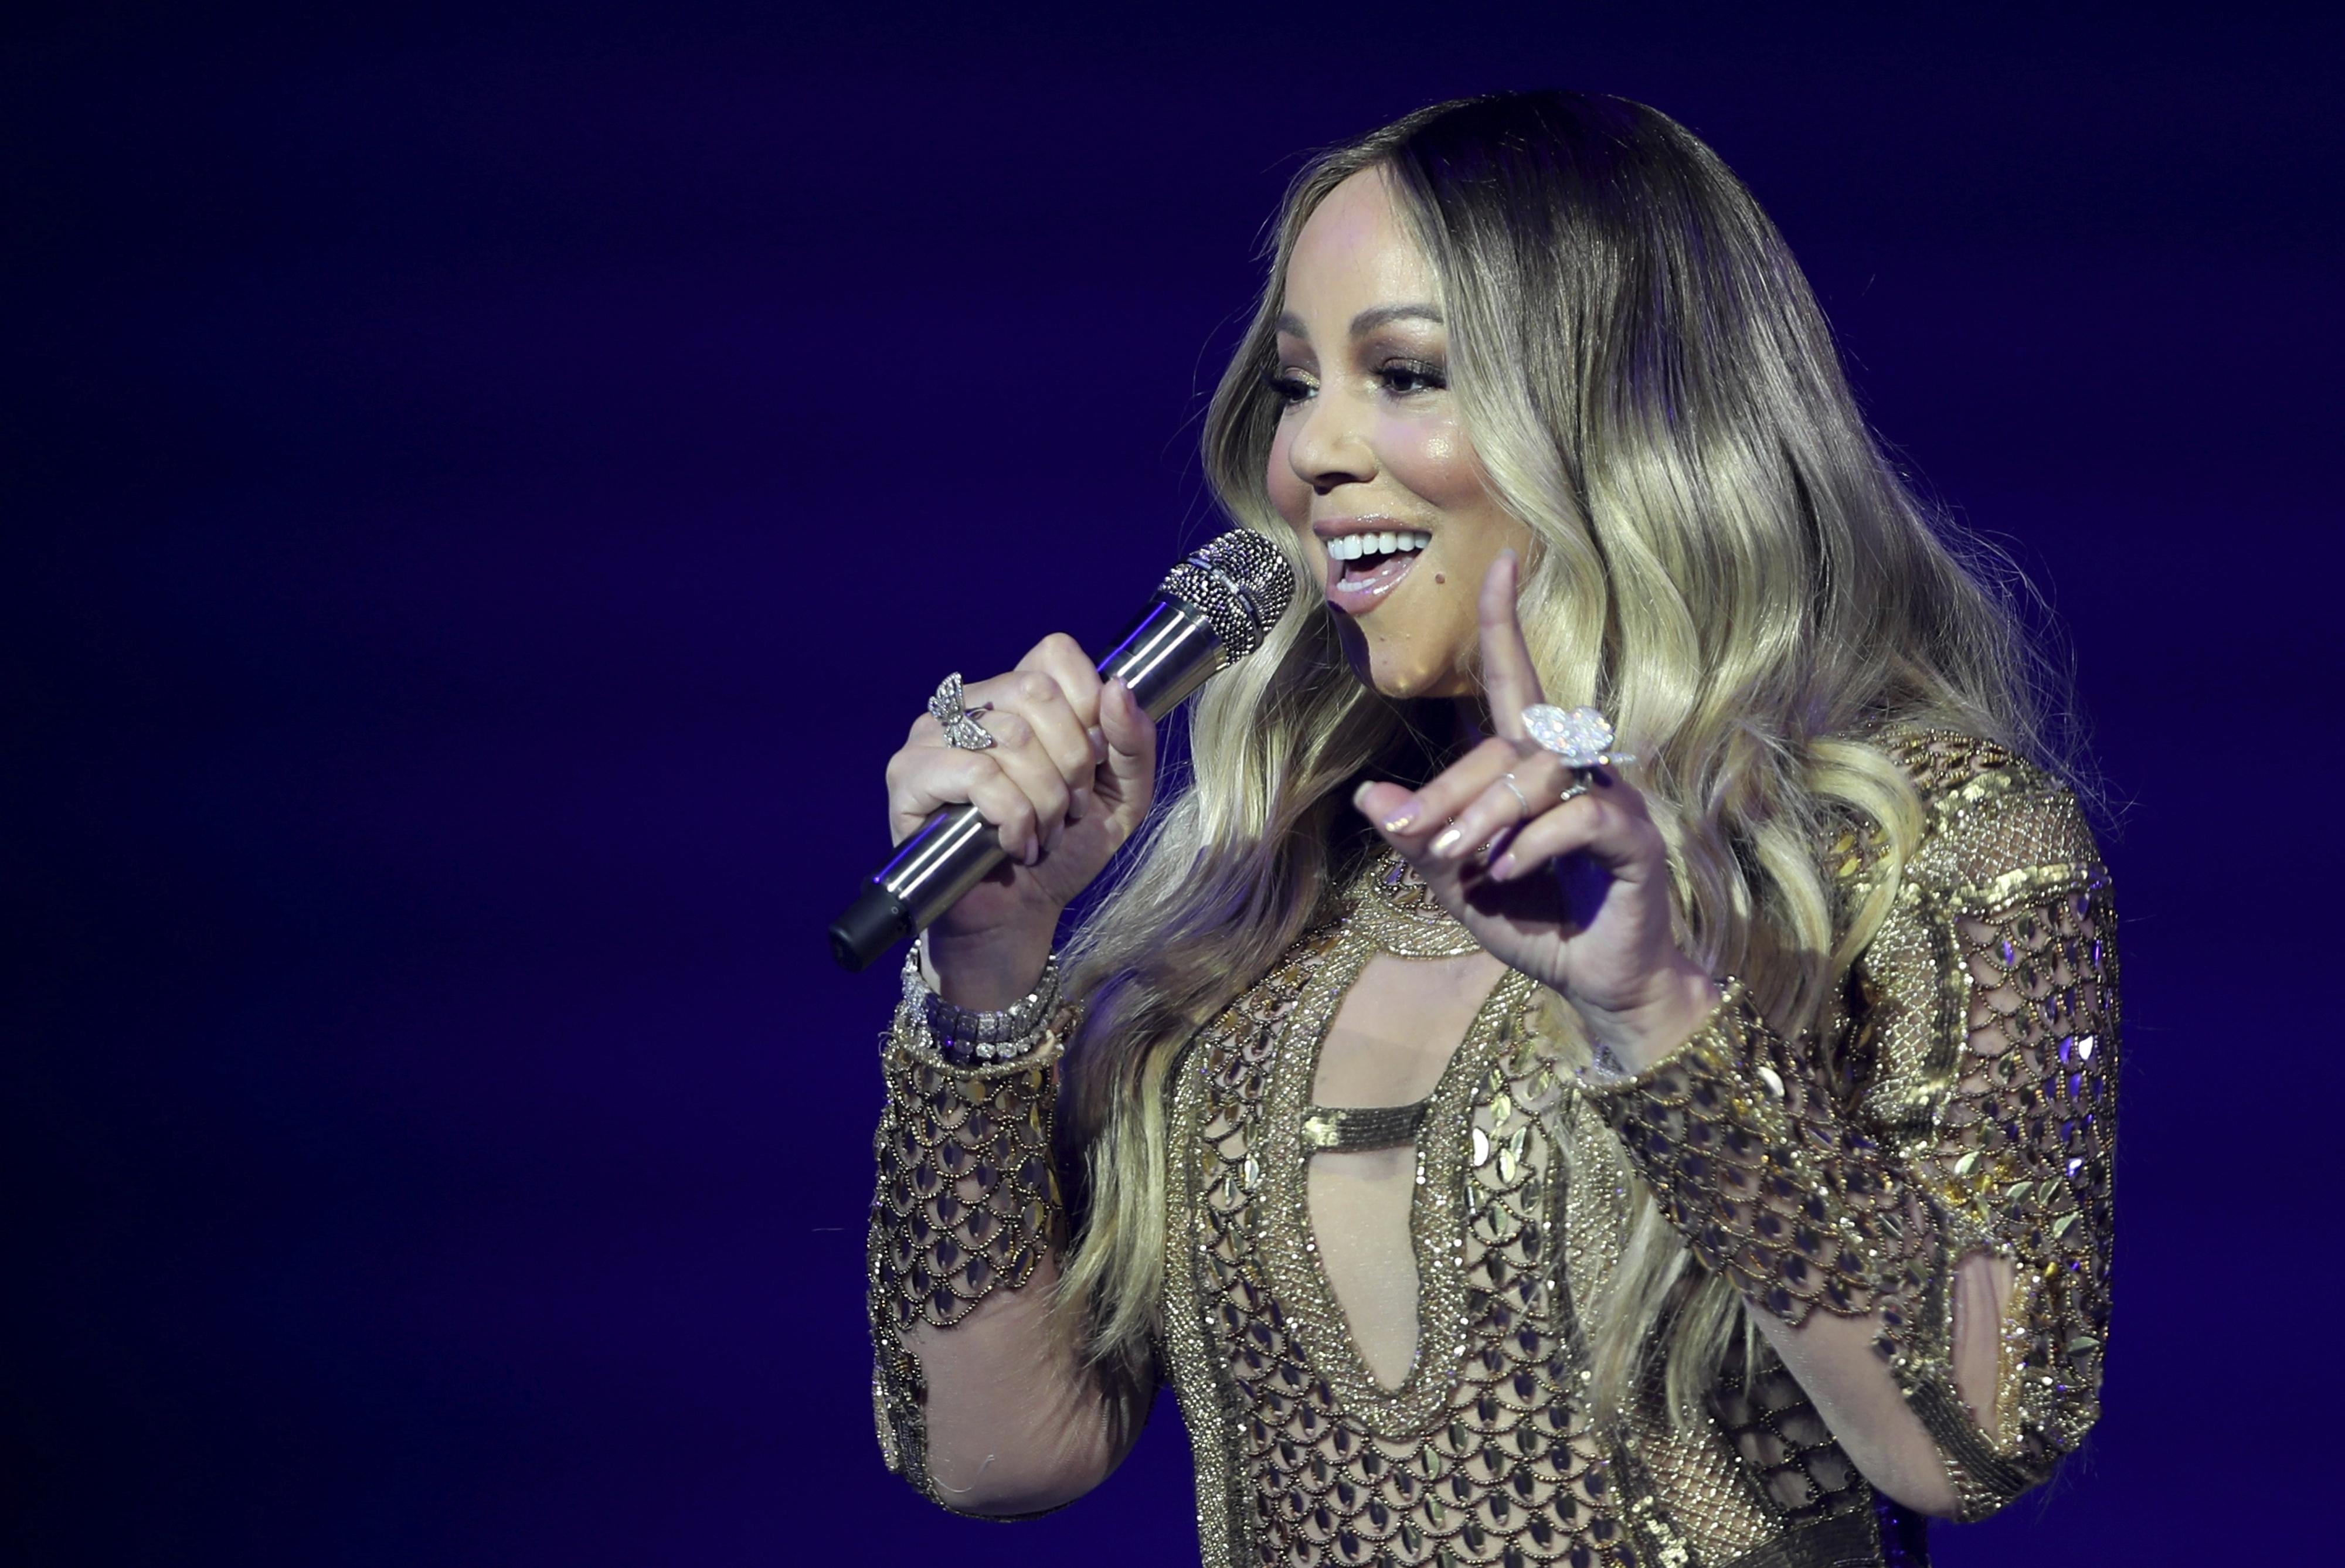 Mariah Carey performs during a concert celebrating Dubai Expo 2020 One Year to Go, in Dubai, United Arab Emirates, Sunday, Oct. 20, 2019.